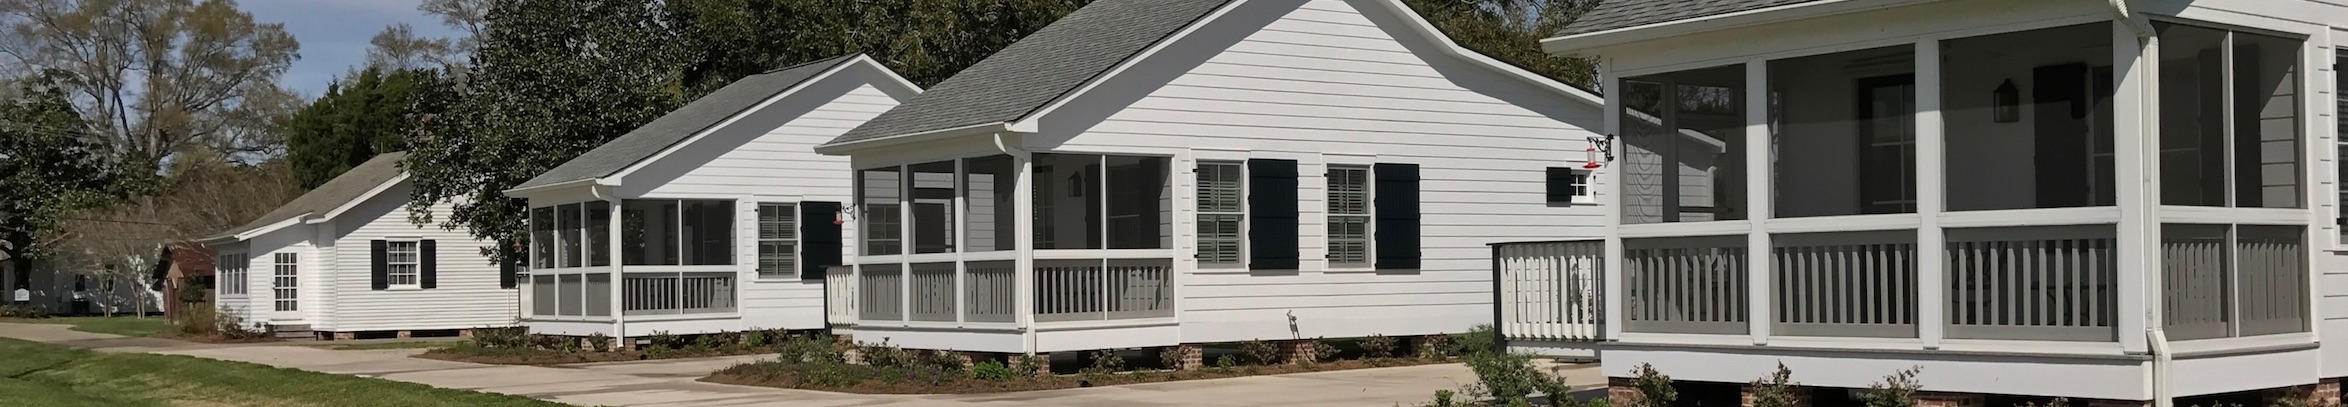 cottage_exterior_banner_0.jpg